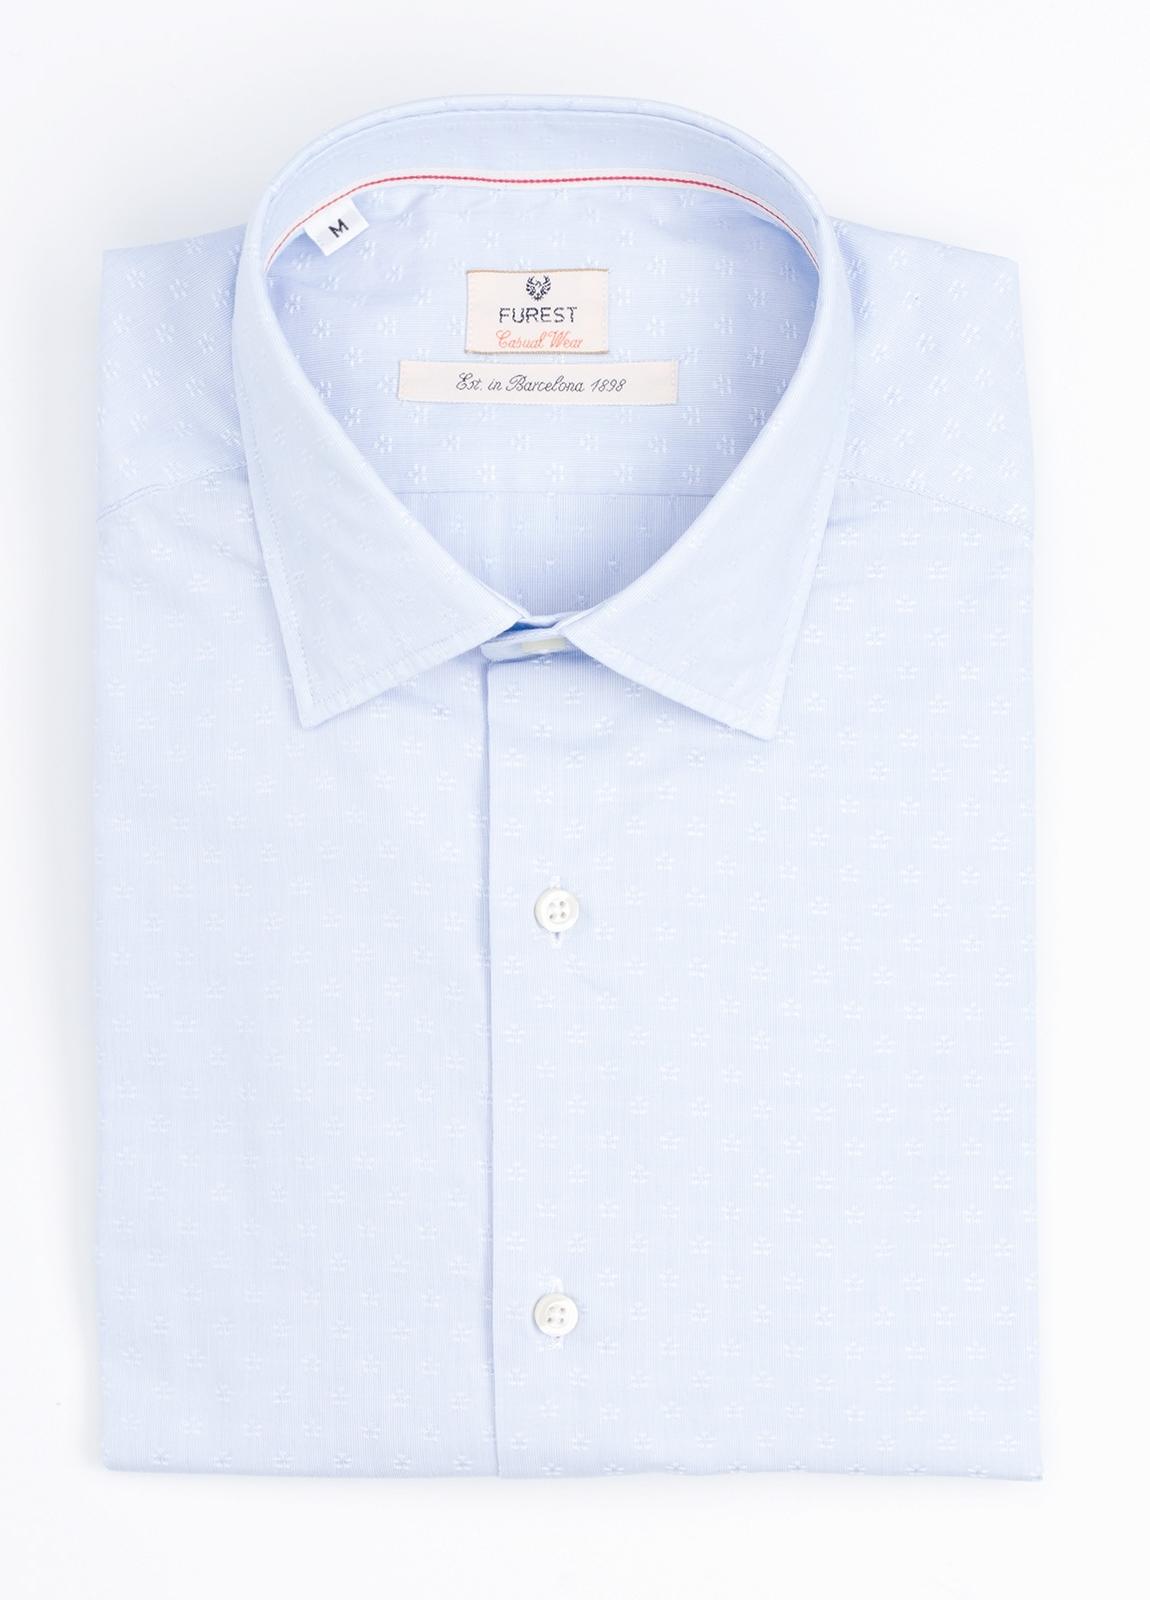 Camisa Casual Wear SLIM FIT Modelo PORTO micrograbado color celeste.100% Algodón.